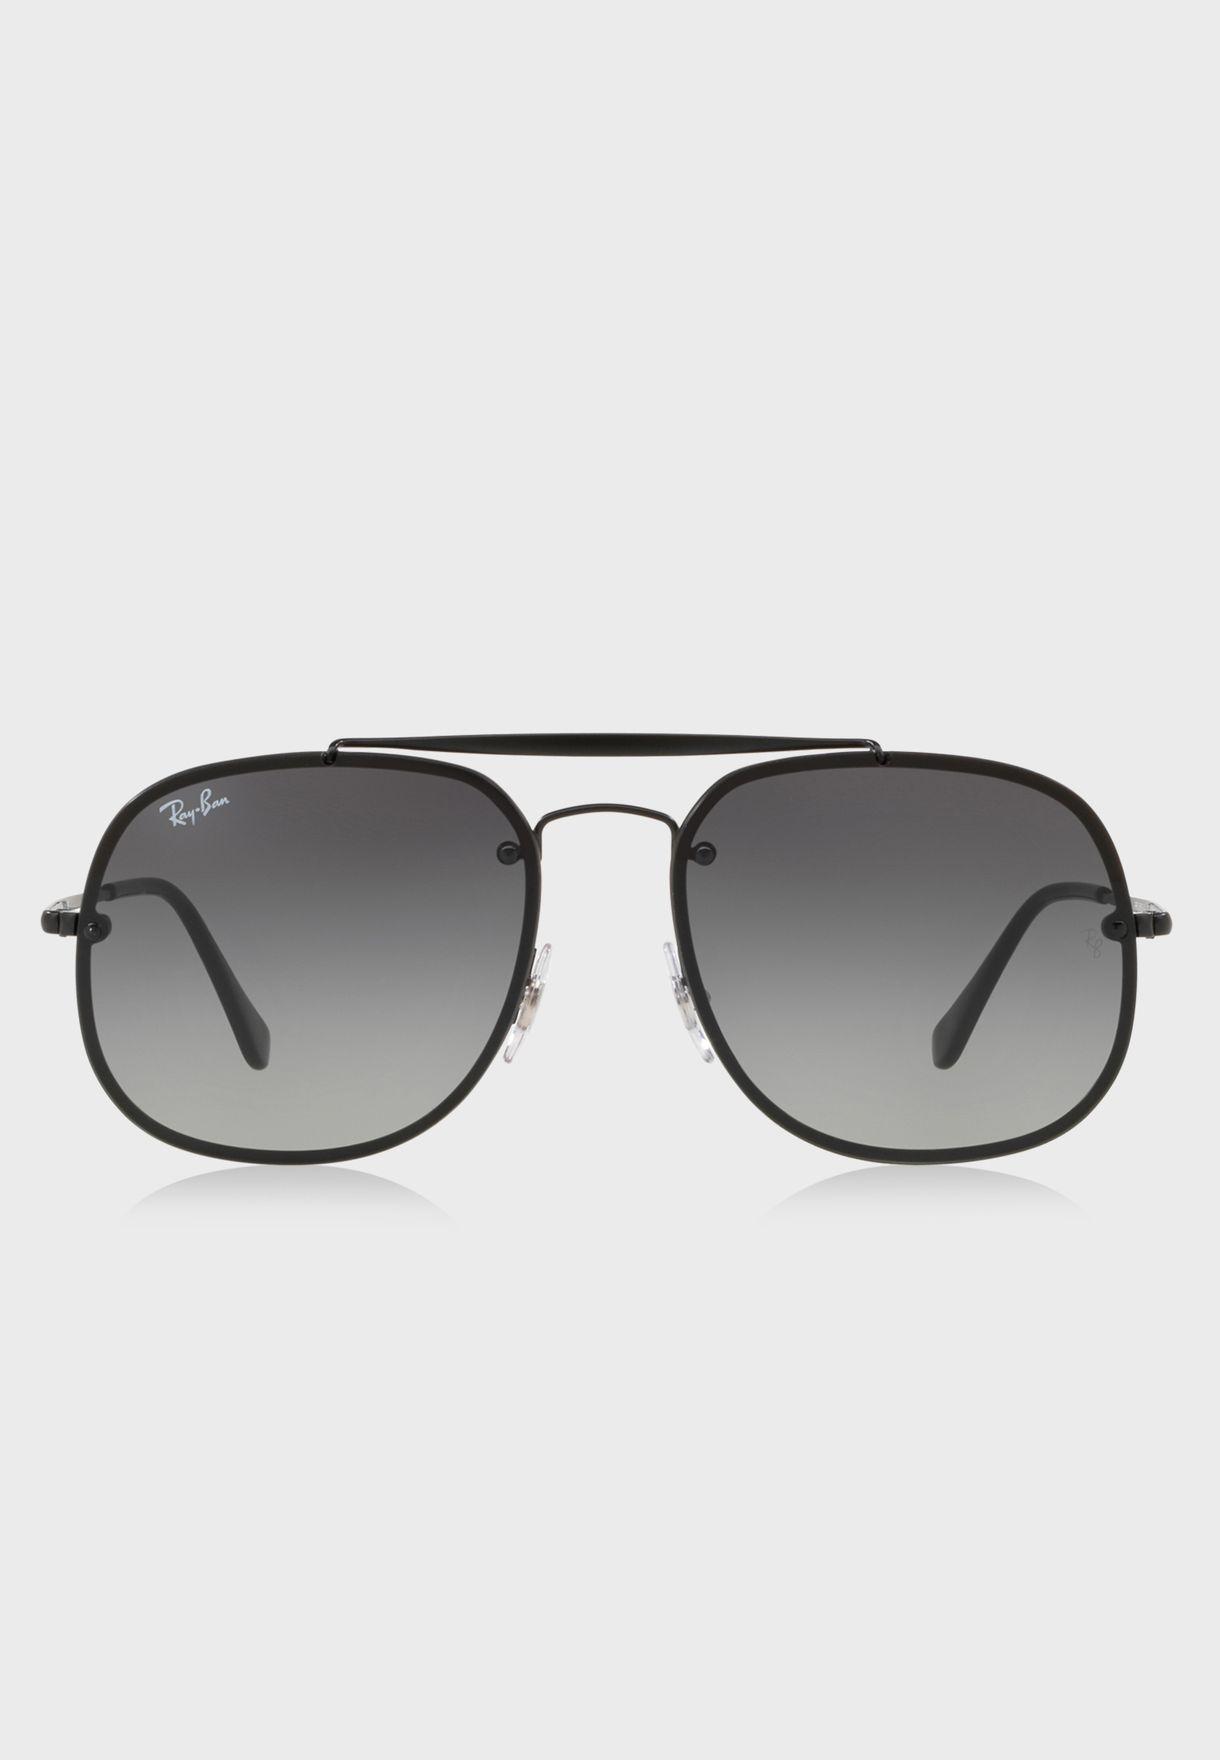 741857ddb8 Shop Ray-Ban black 0RB3583N Blaze General Sunglasses 8053672866575 ...